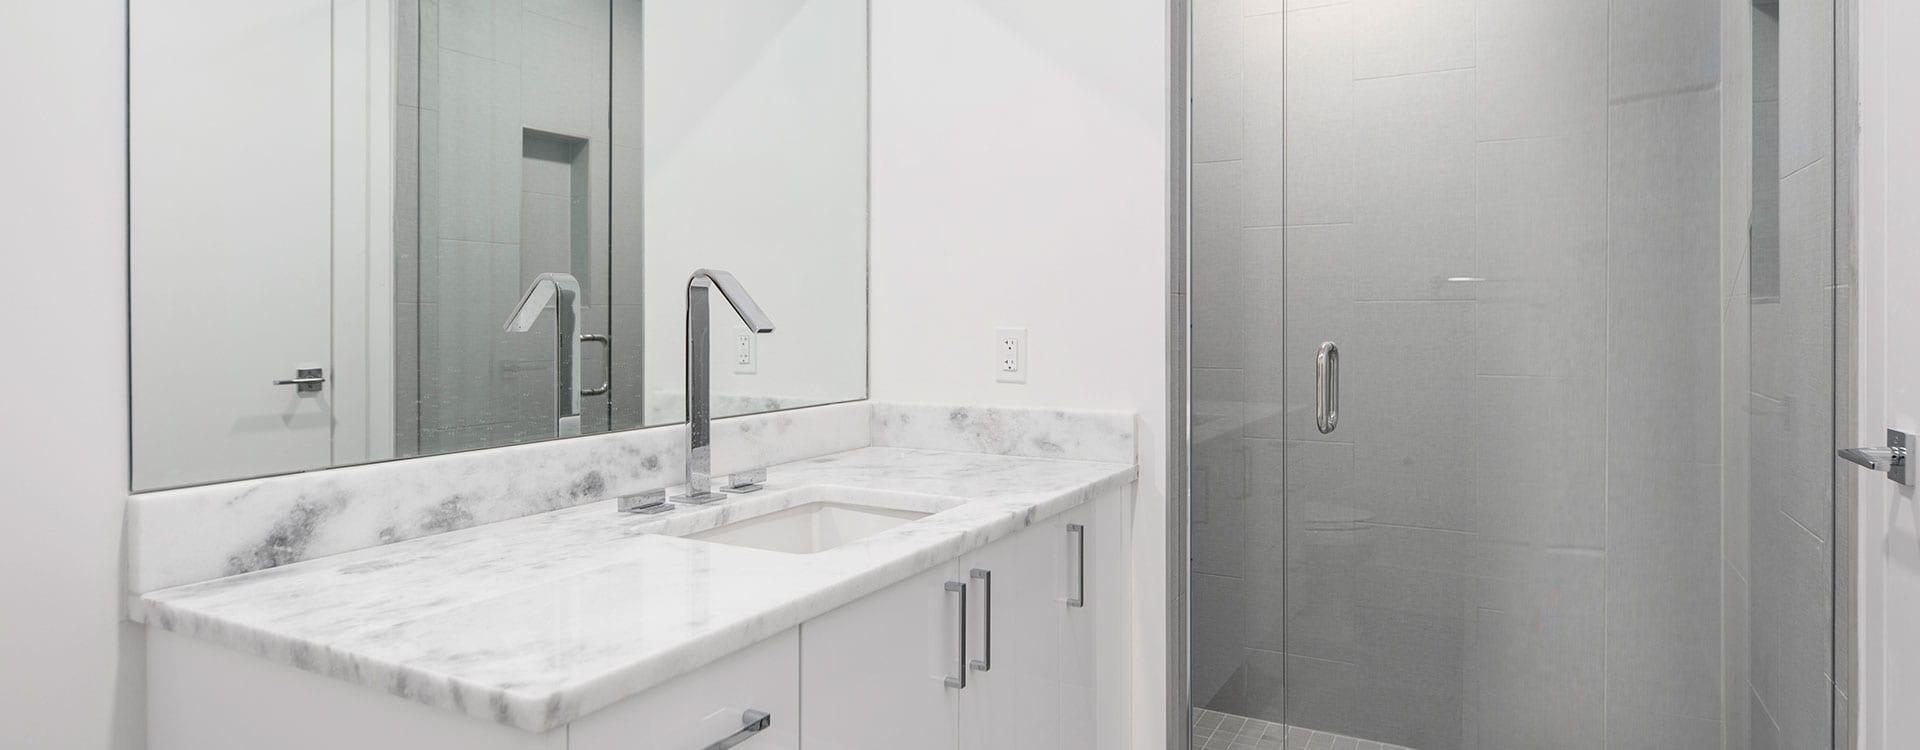 BLVD Residence 903 Bath